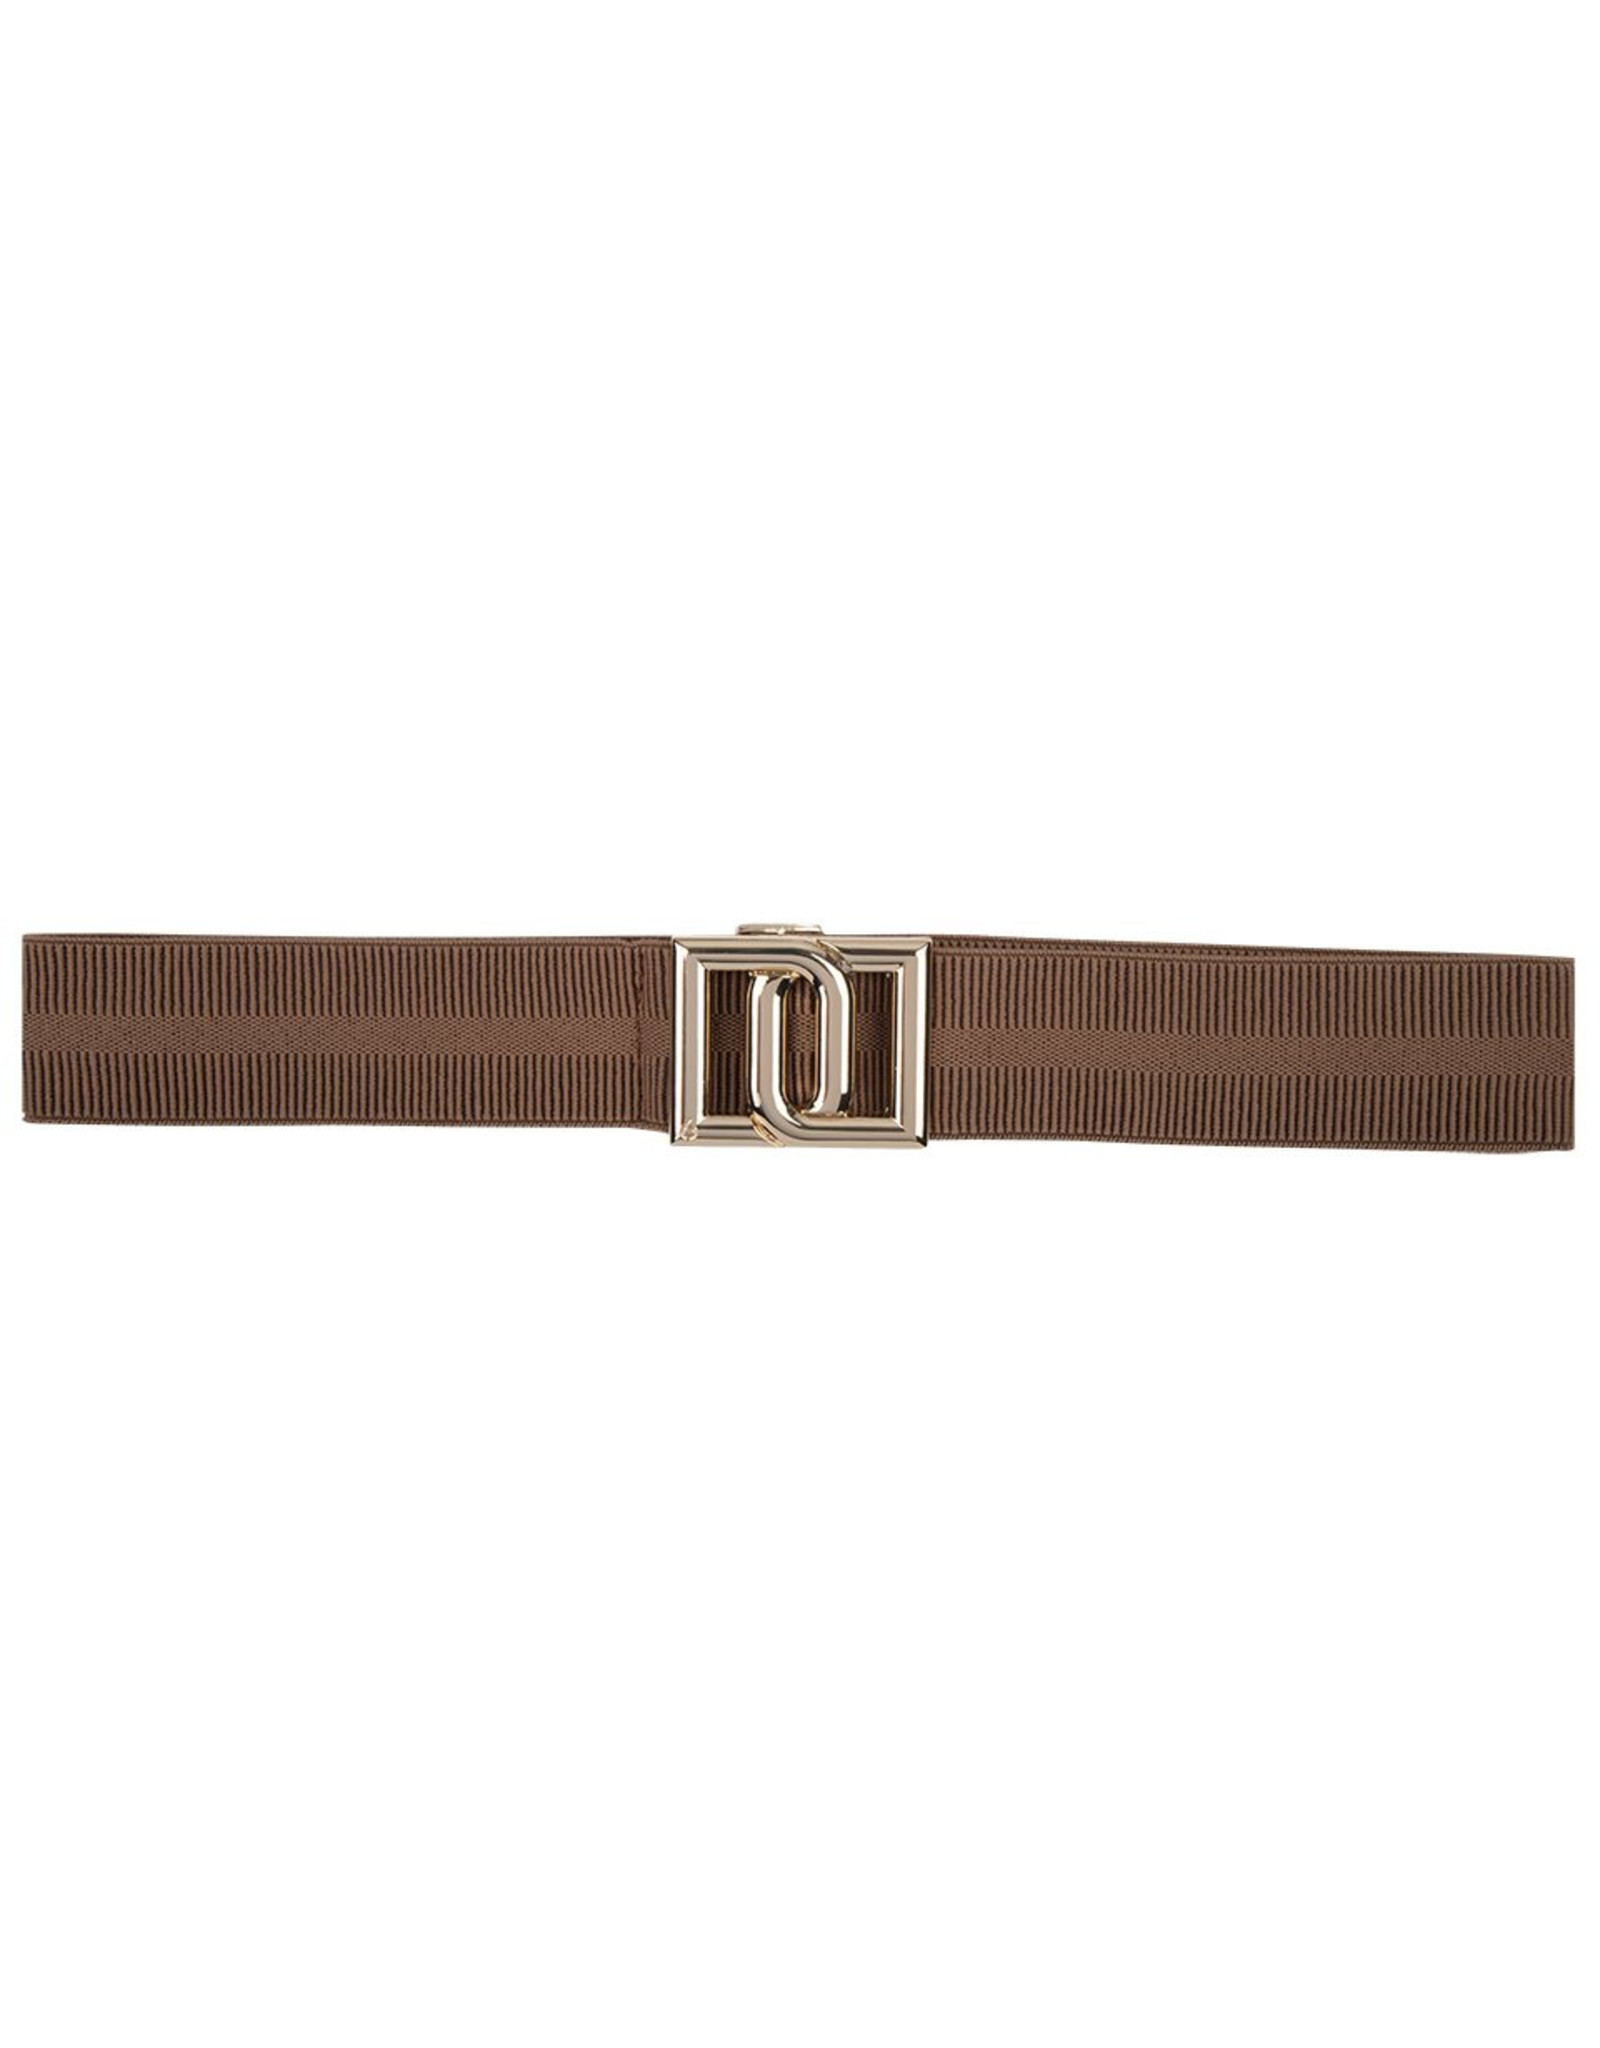 Dante6 Monogram belt Toffee